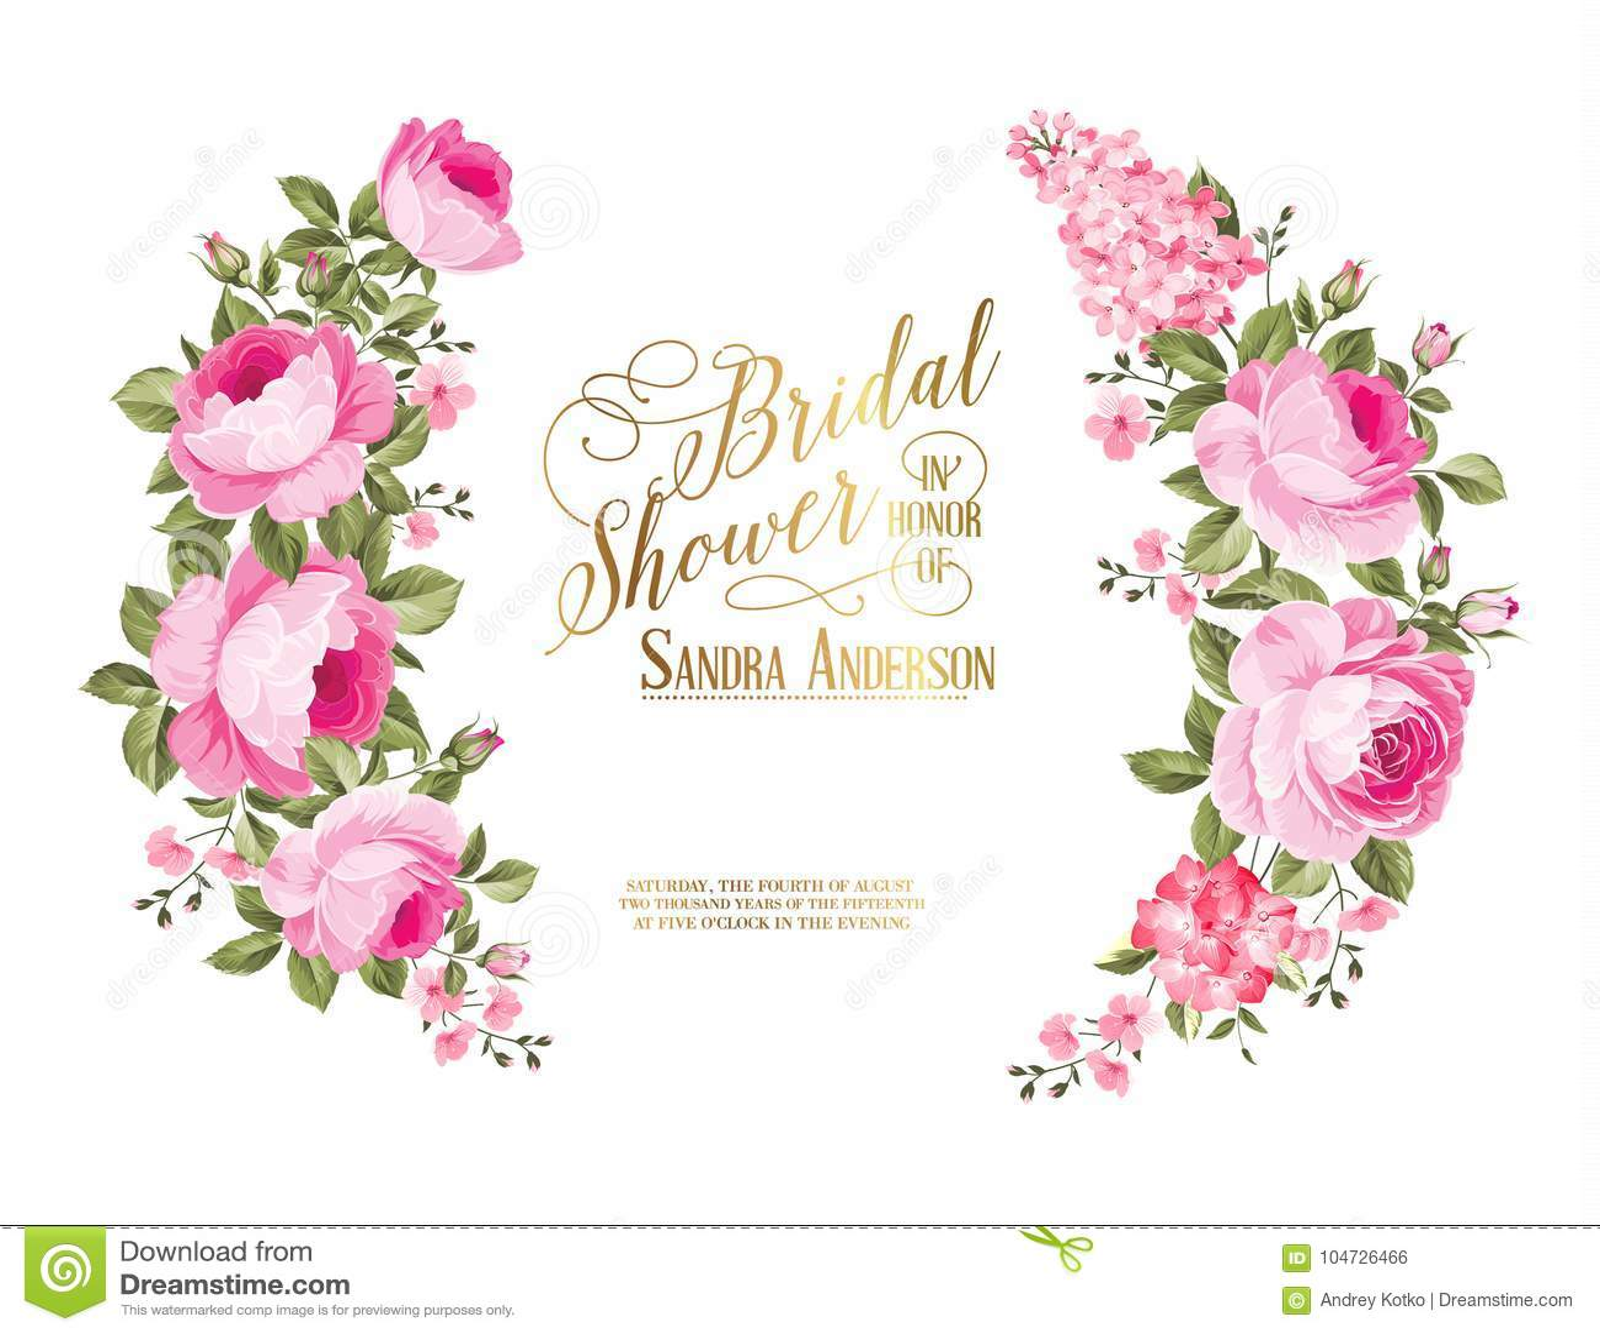 4f3668cb0e5 The Bridal Shower Invitation. Stock Vector - Illustration of leaf ...